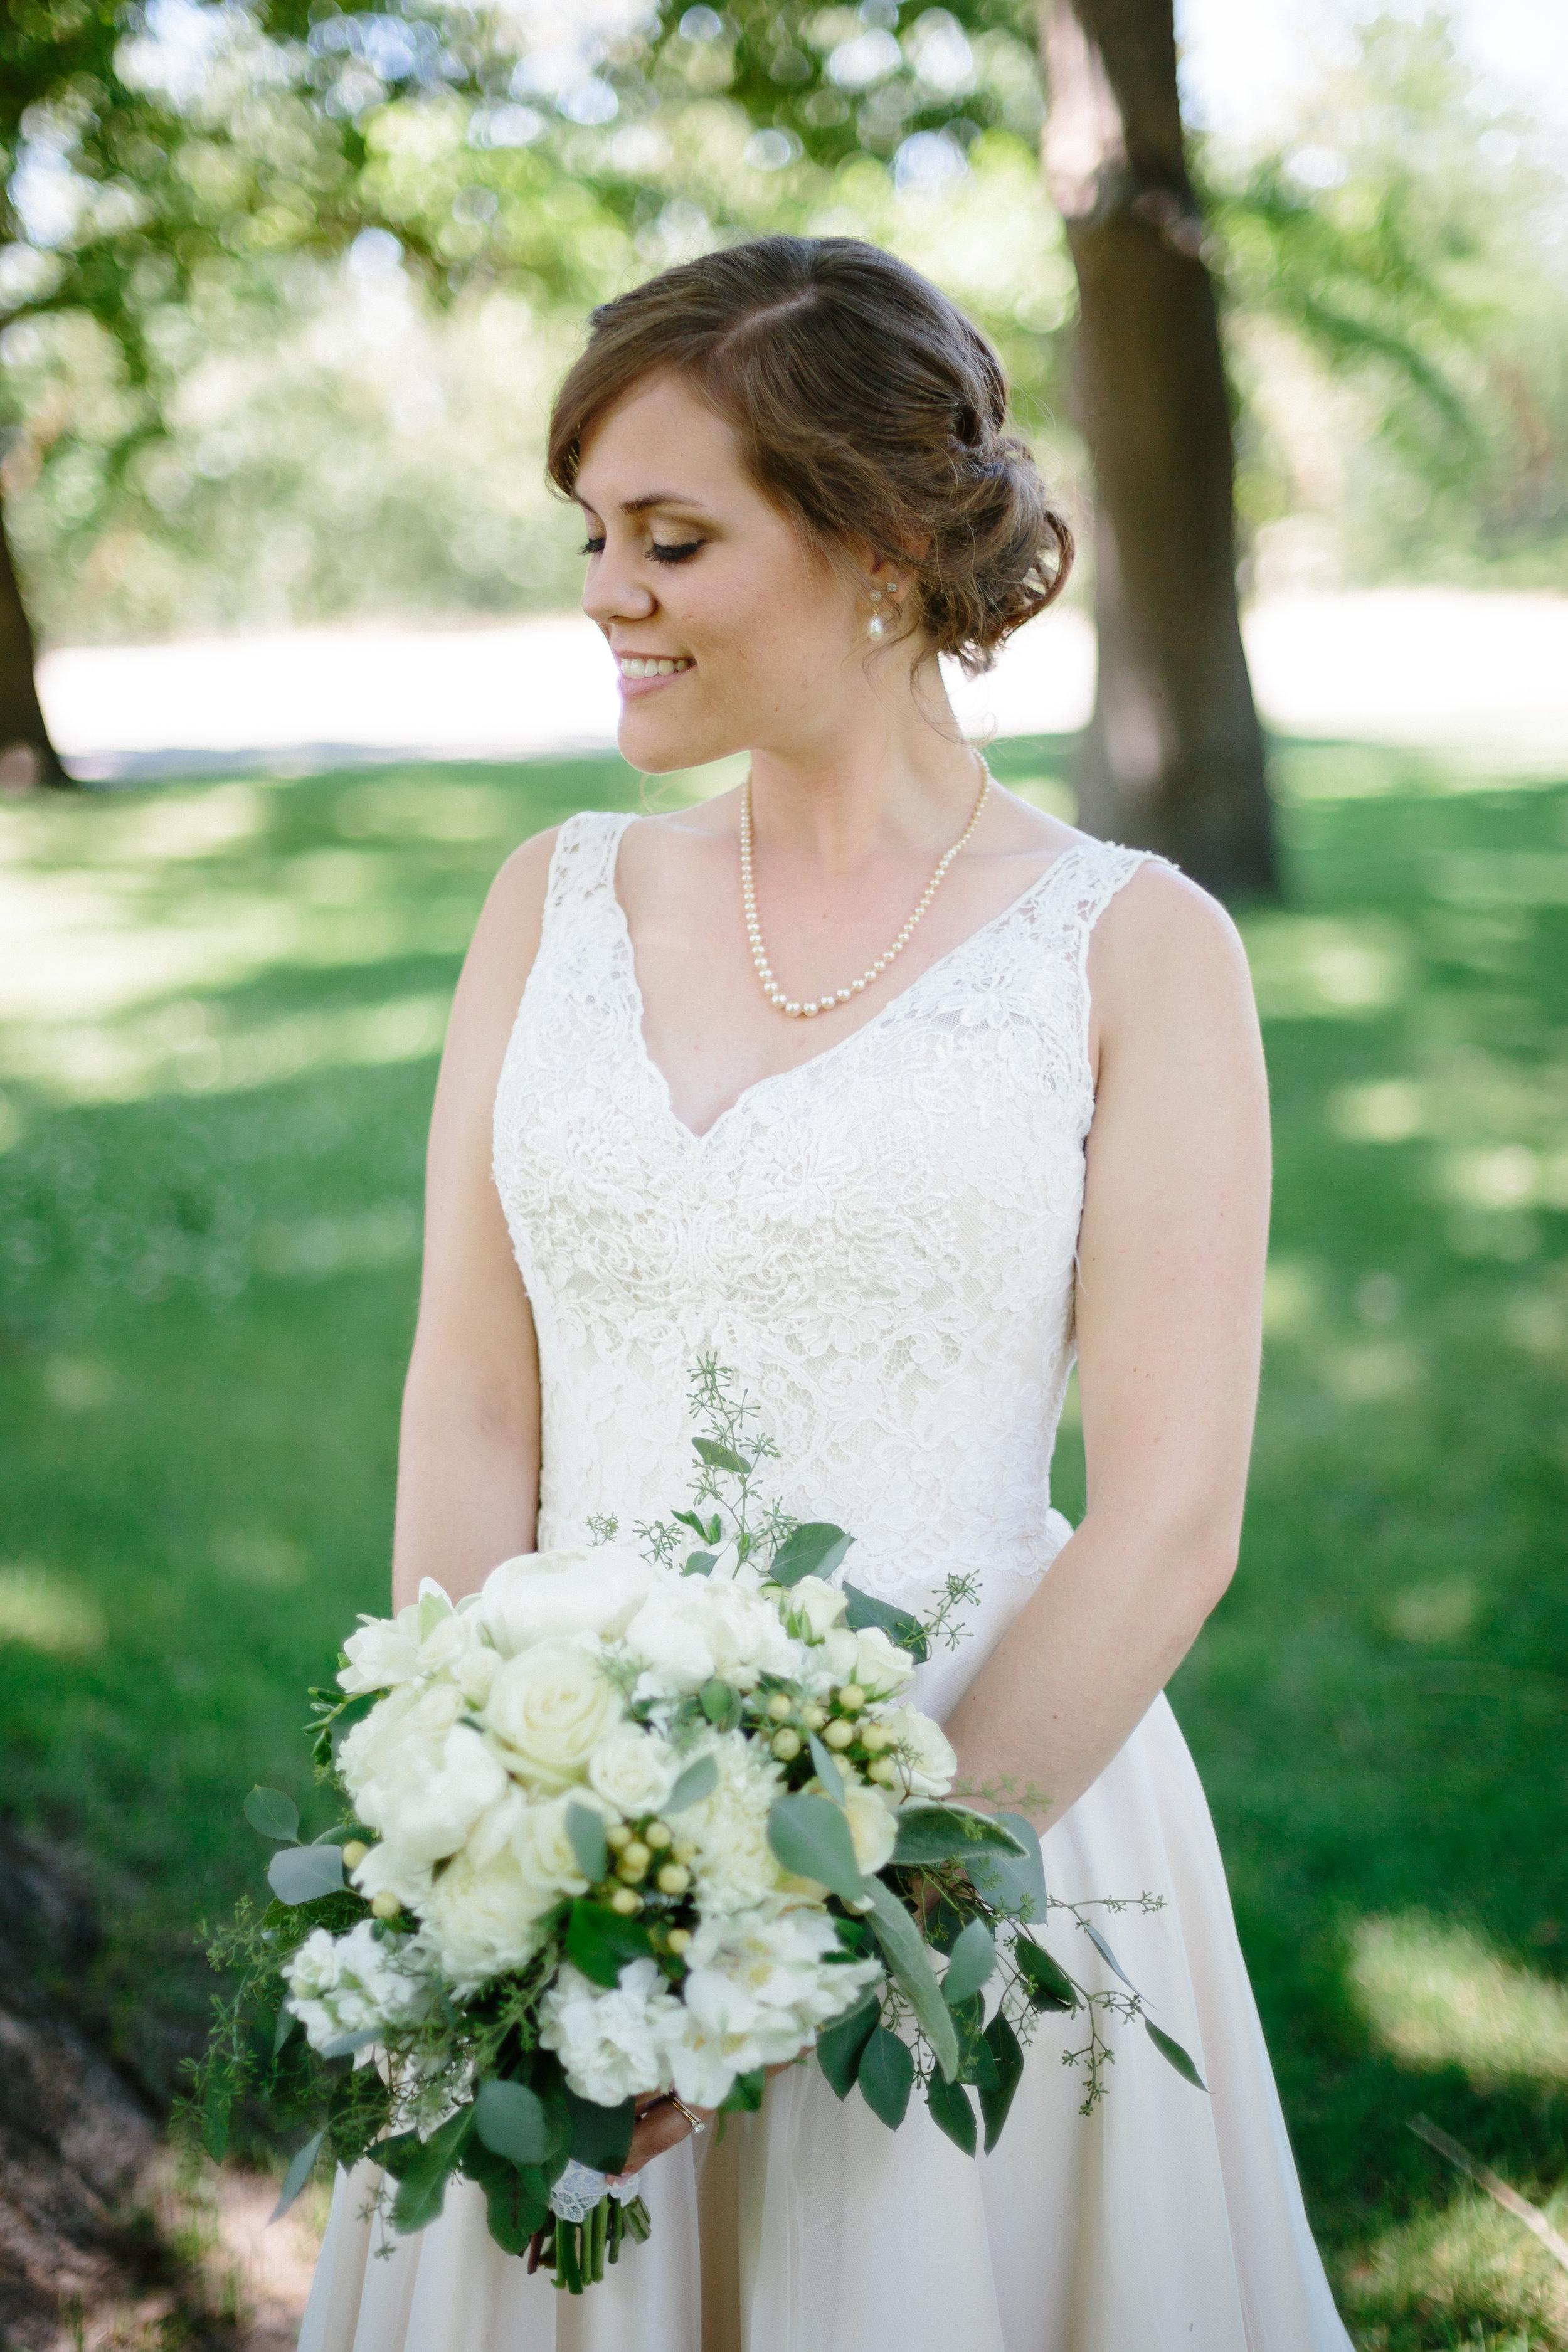 Jordan & Shantel Married - Idaho - Corrie Mick Photography-134.jpg